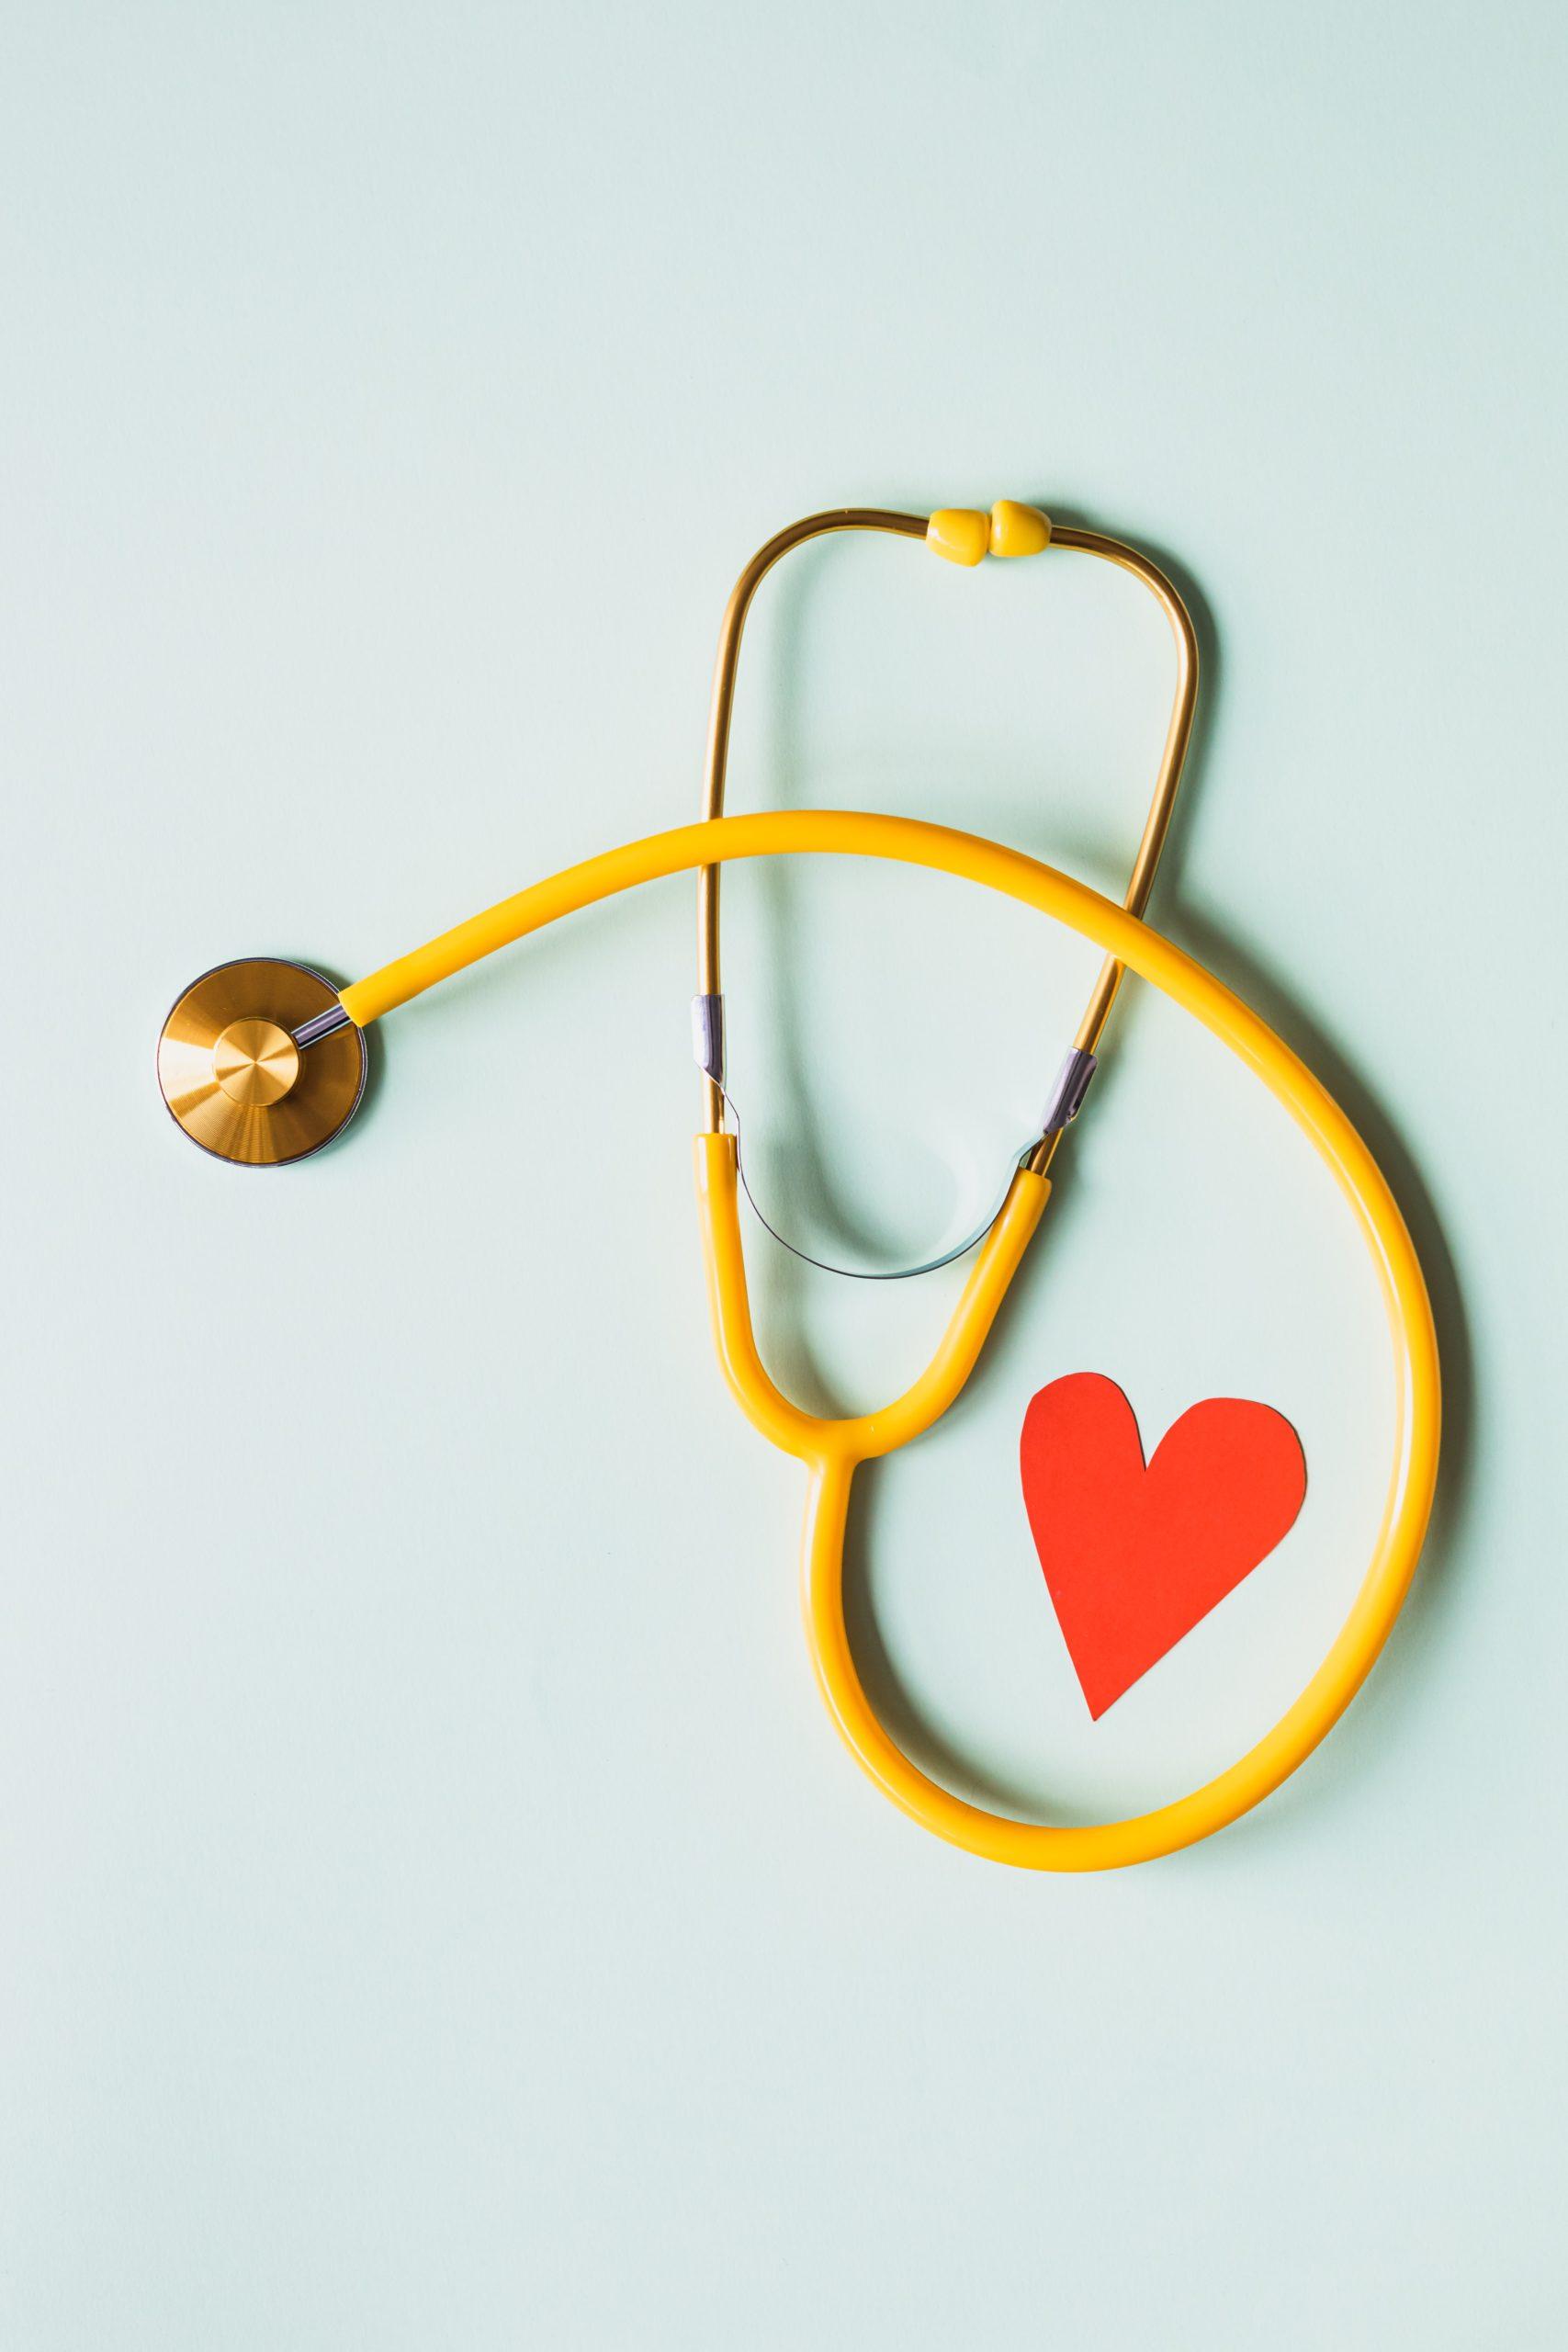 Where Does Health Insurance Money Go